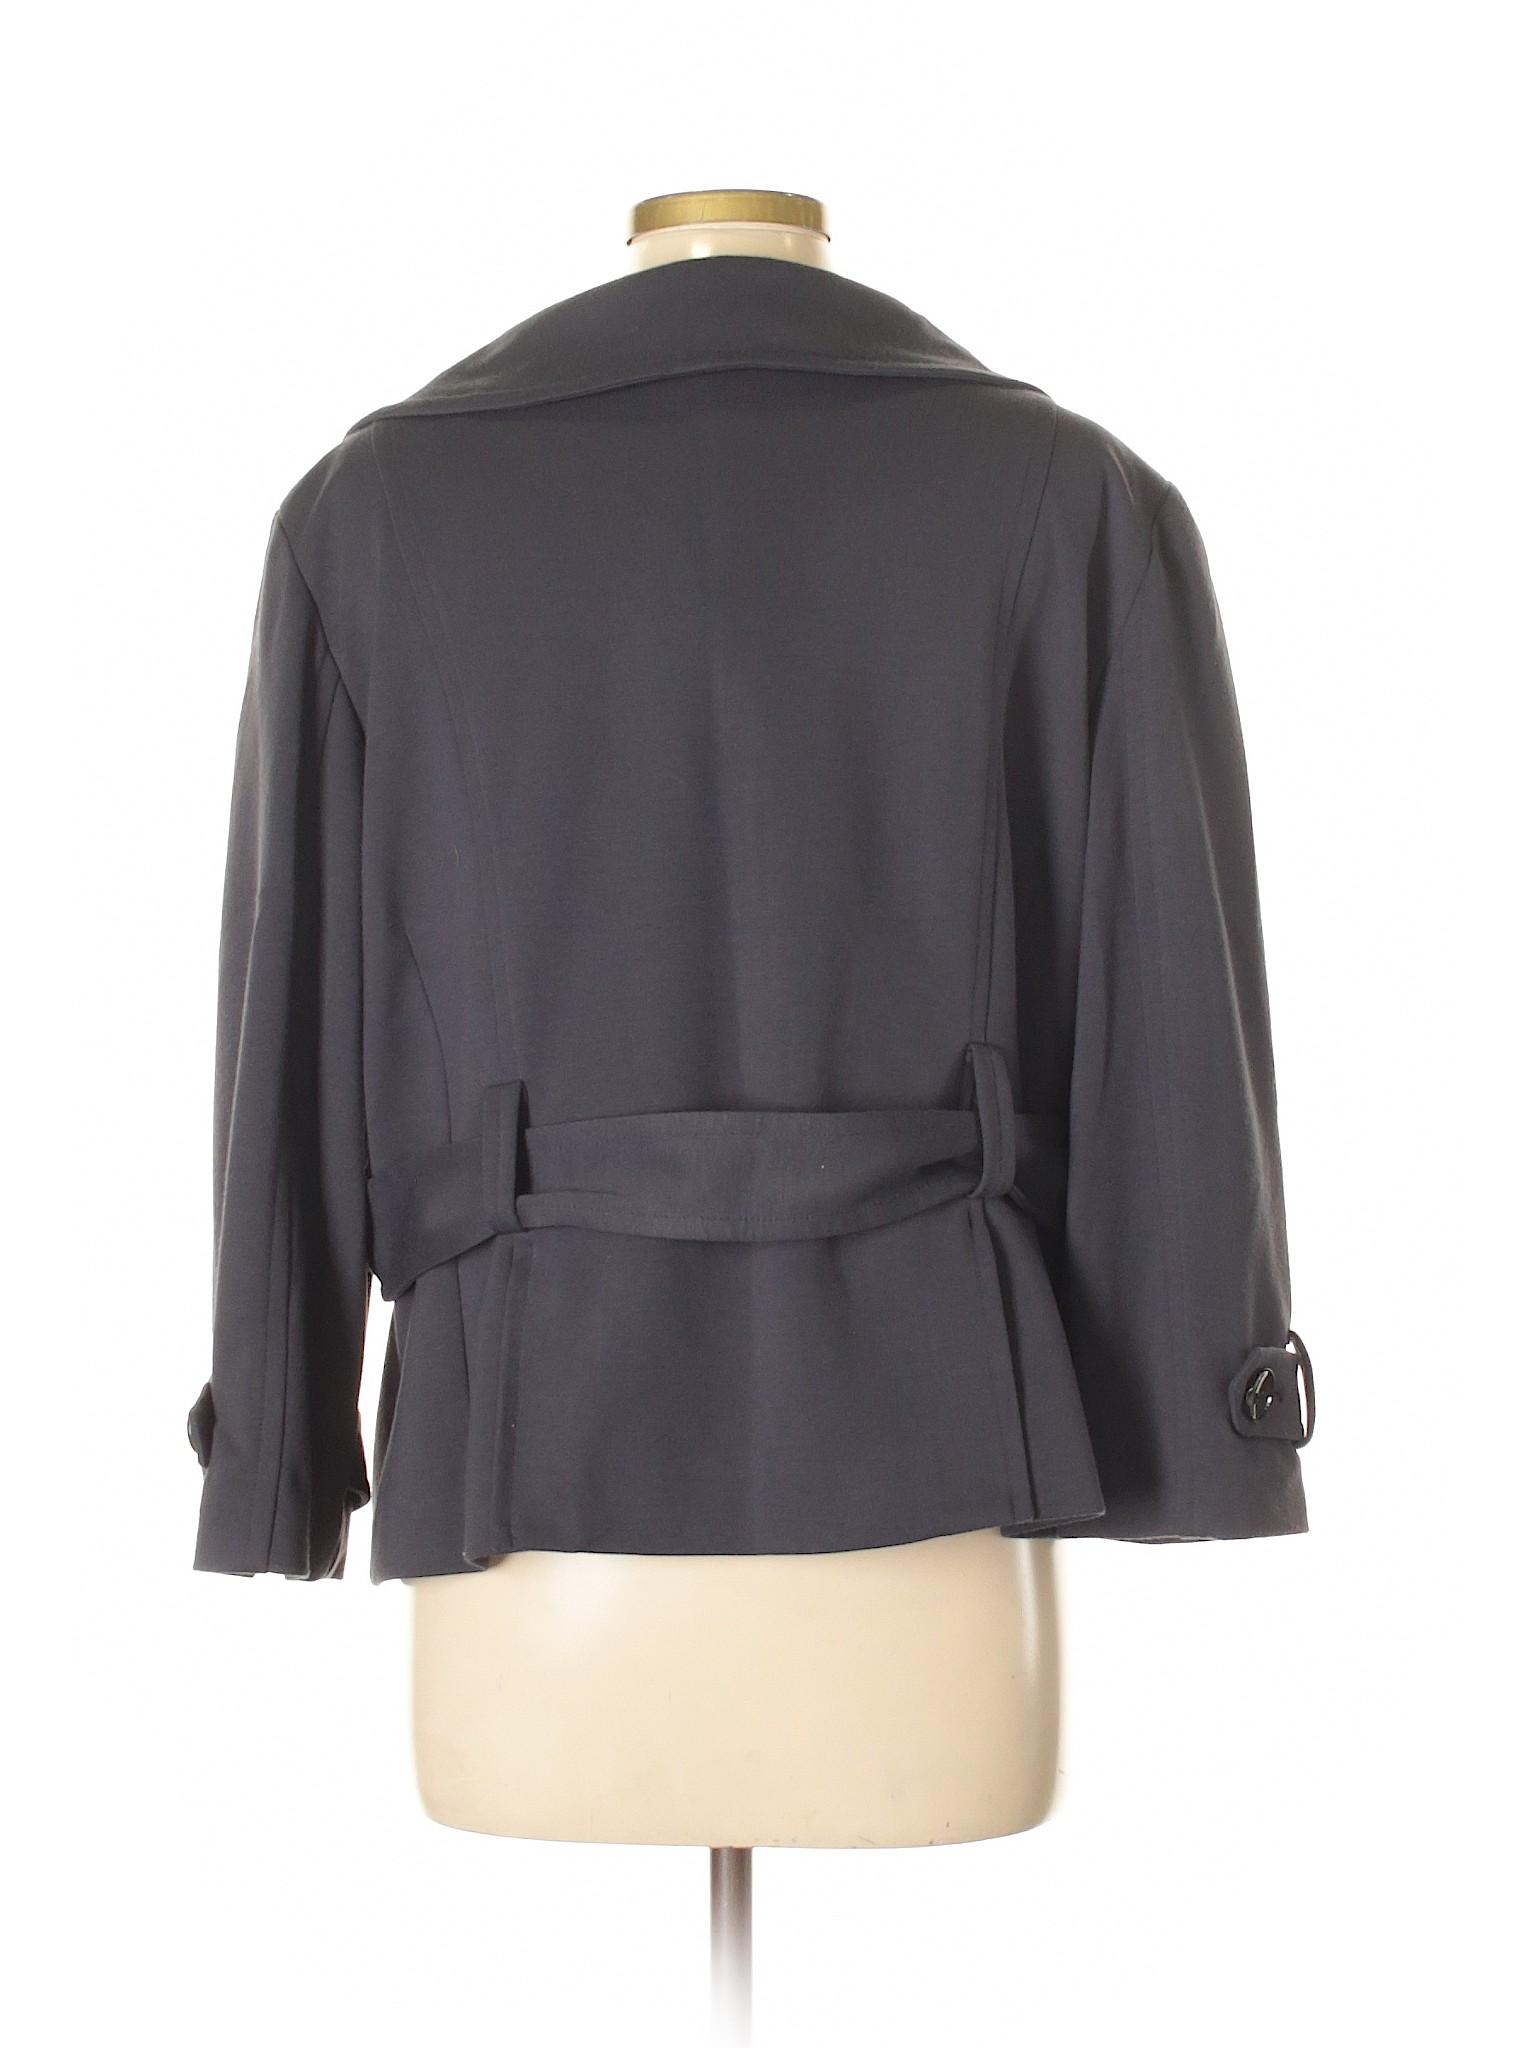 Jacket Winter Boutique Sandro Boutique Sportswear Winter cEWqvWrX